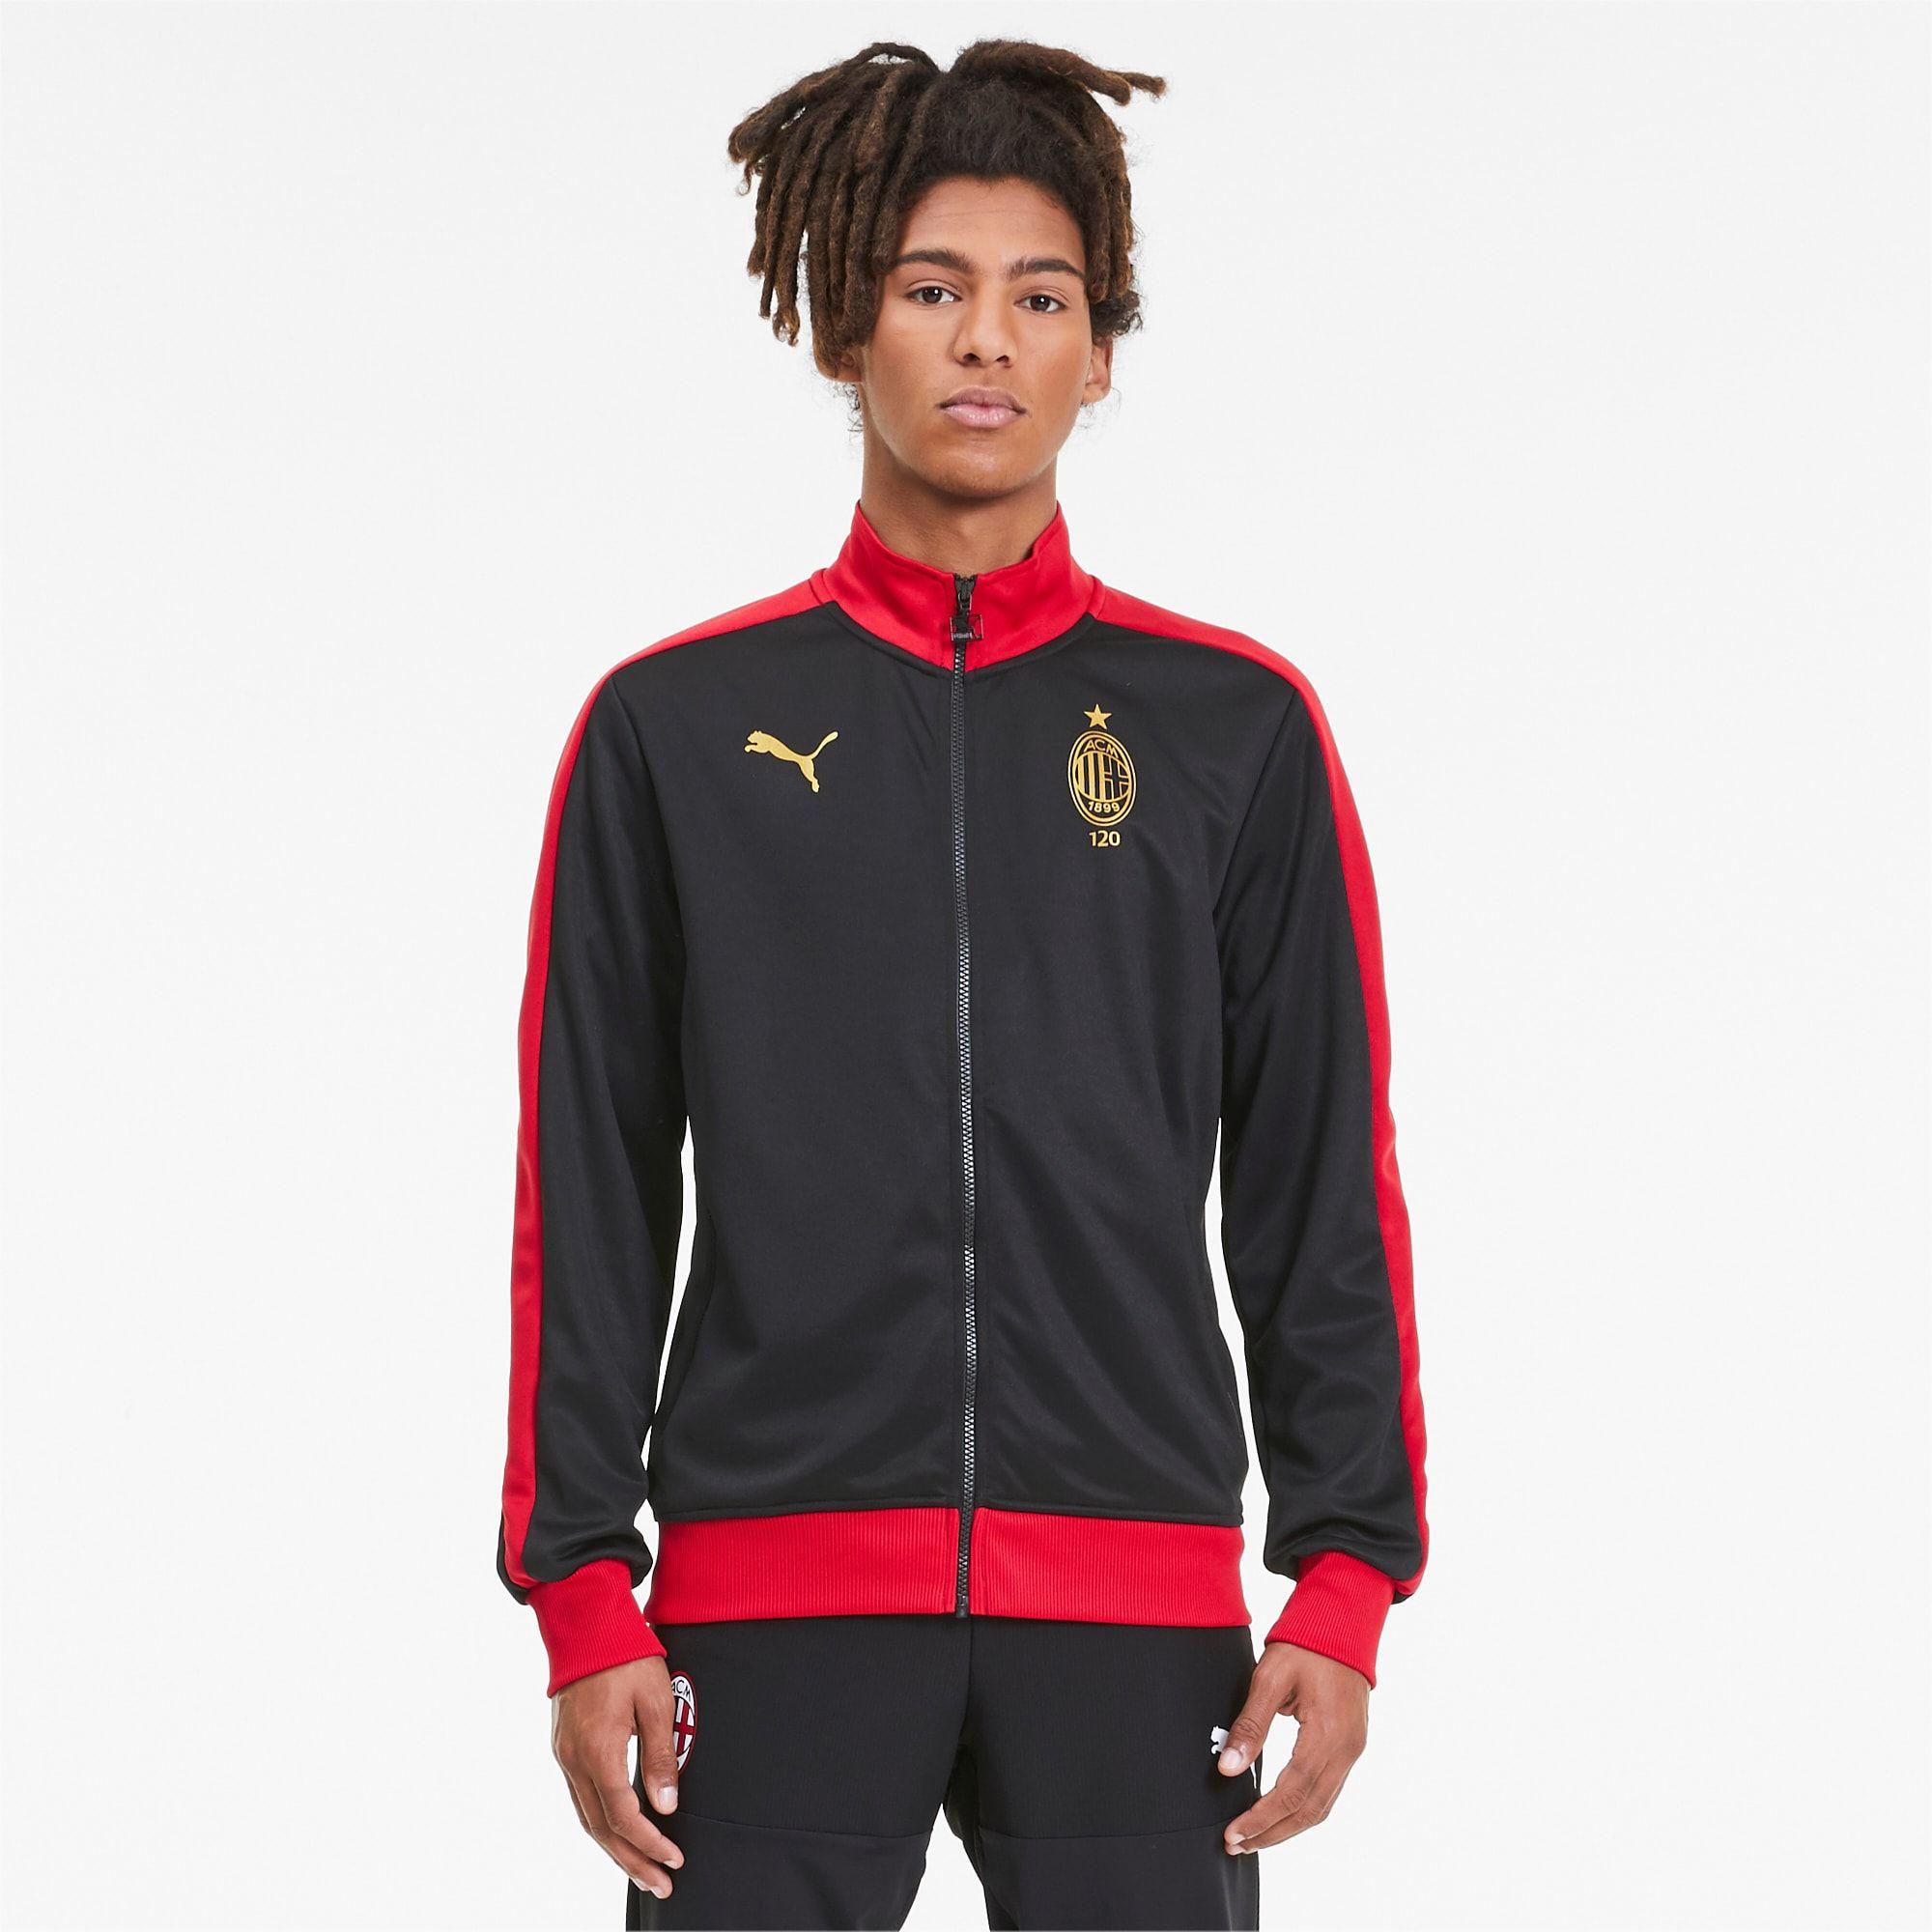 Adidas Originals AC Milan Superstar Track Top Black Victory Red